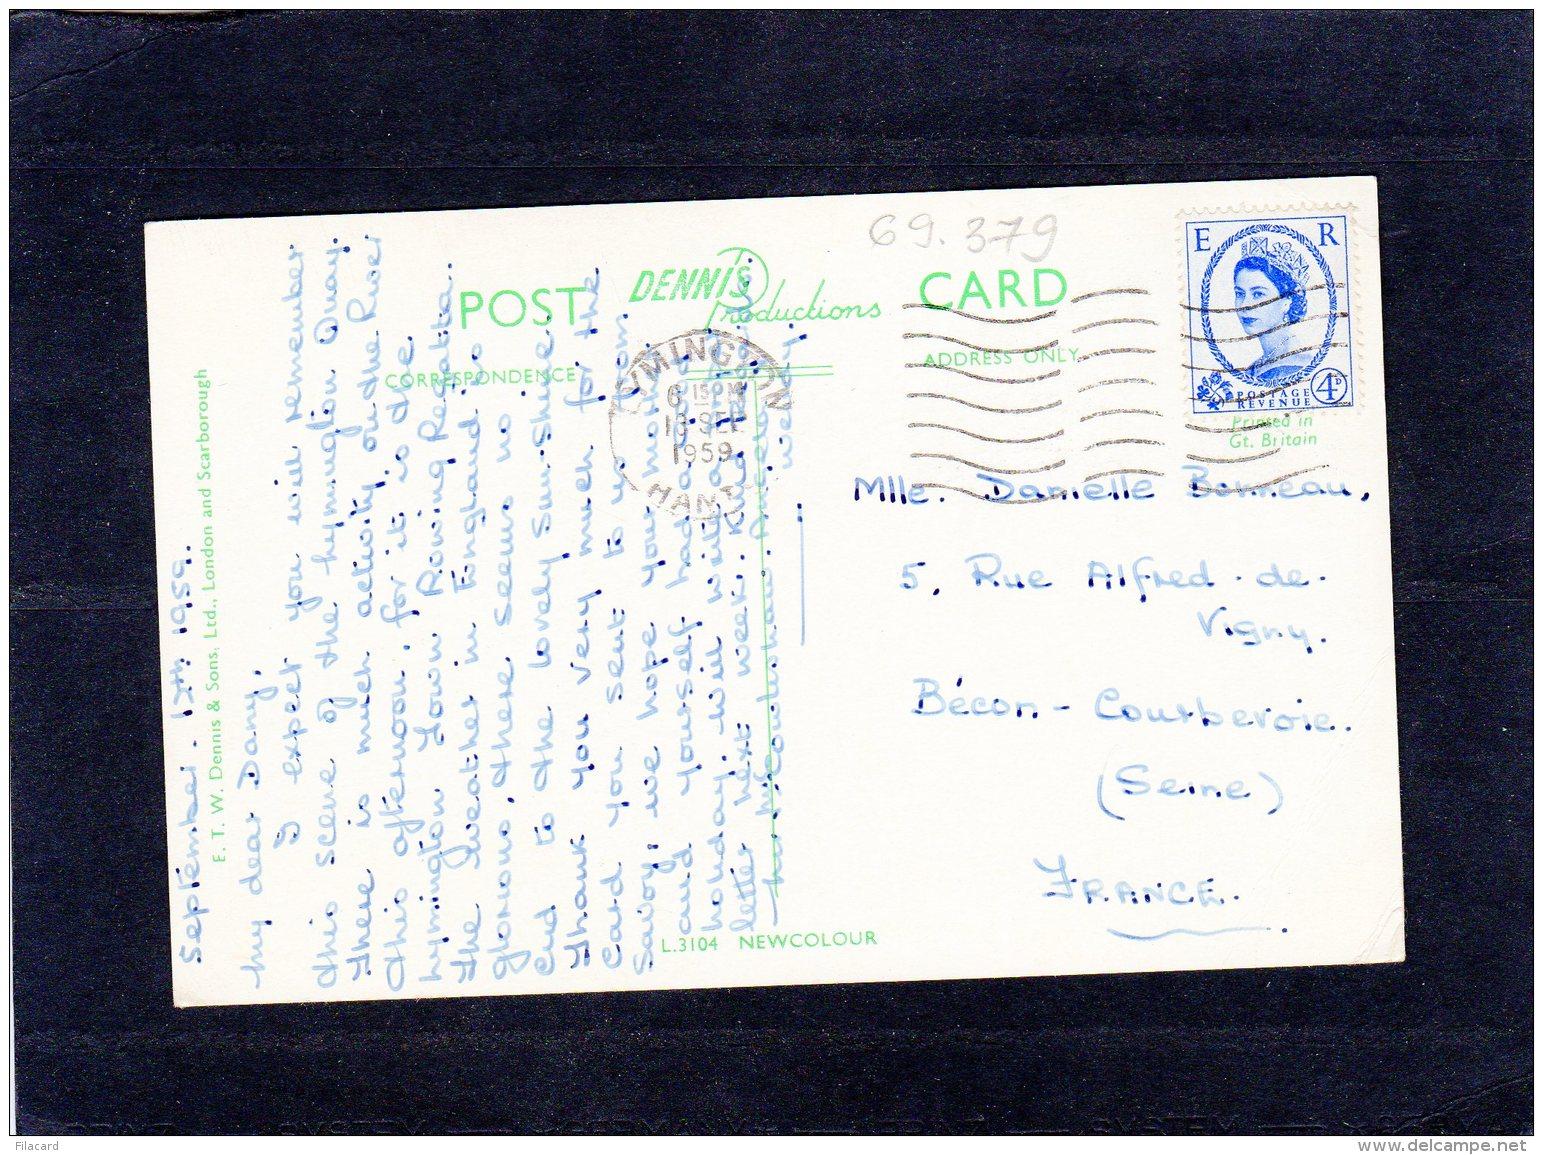 69379    Regno  Unito,  The  Quai,  Lymingston,  Hants.,  VG  1959 - Inghilterra